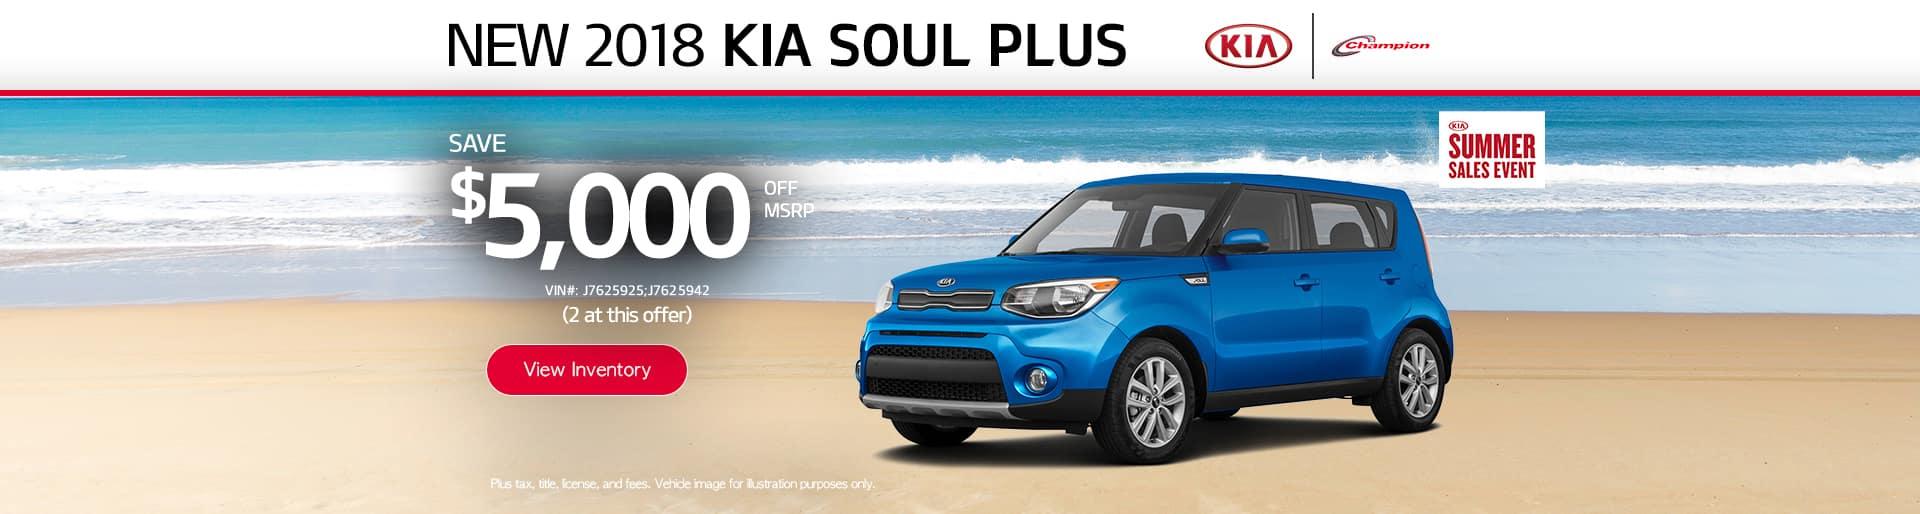 desktop TK 2018 Kia Soul Plus